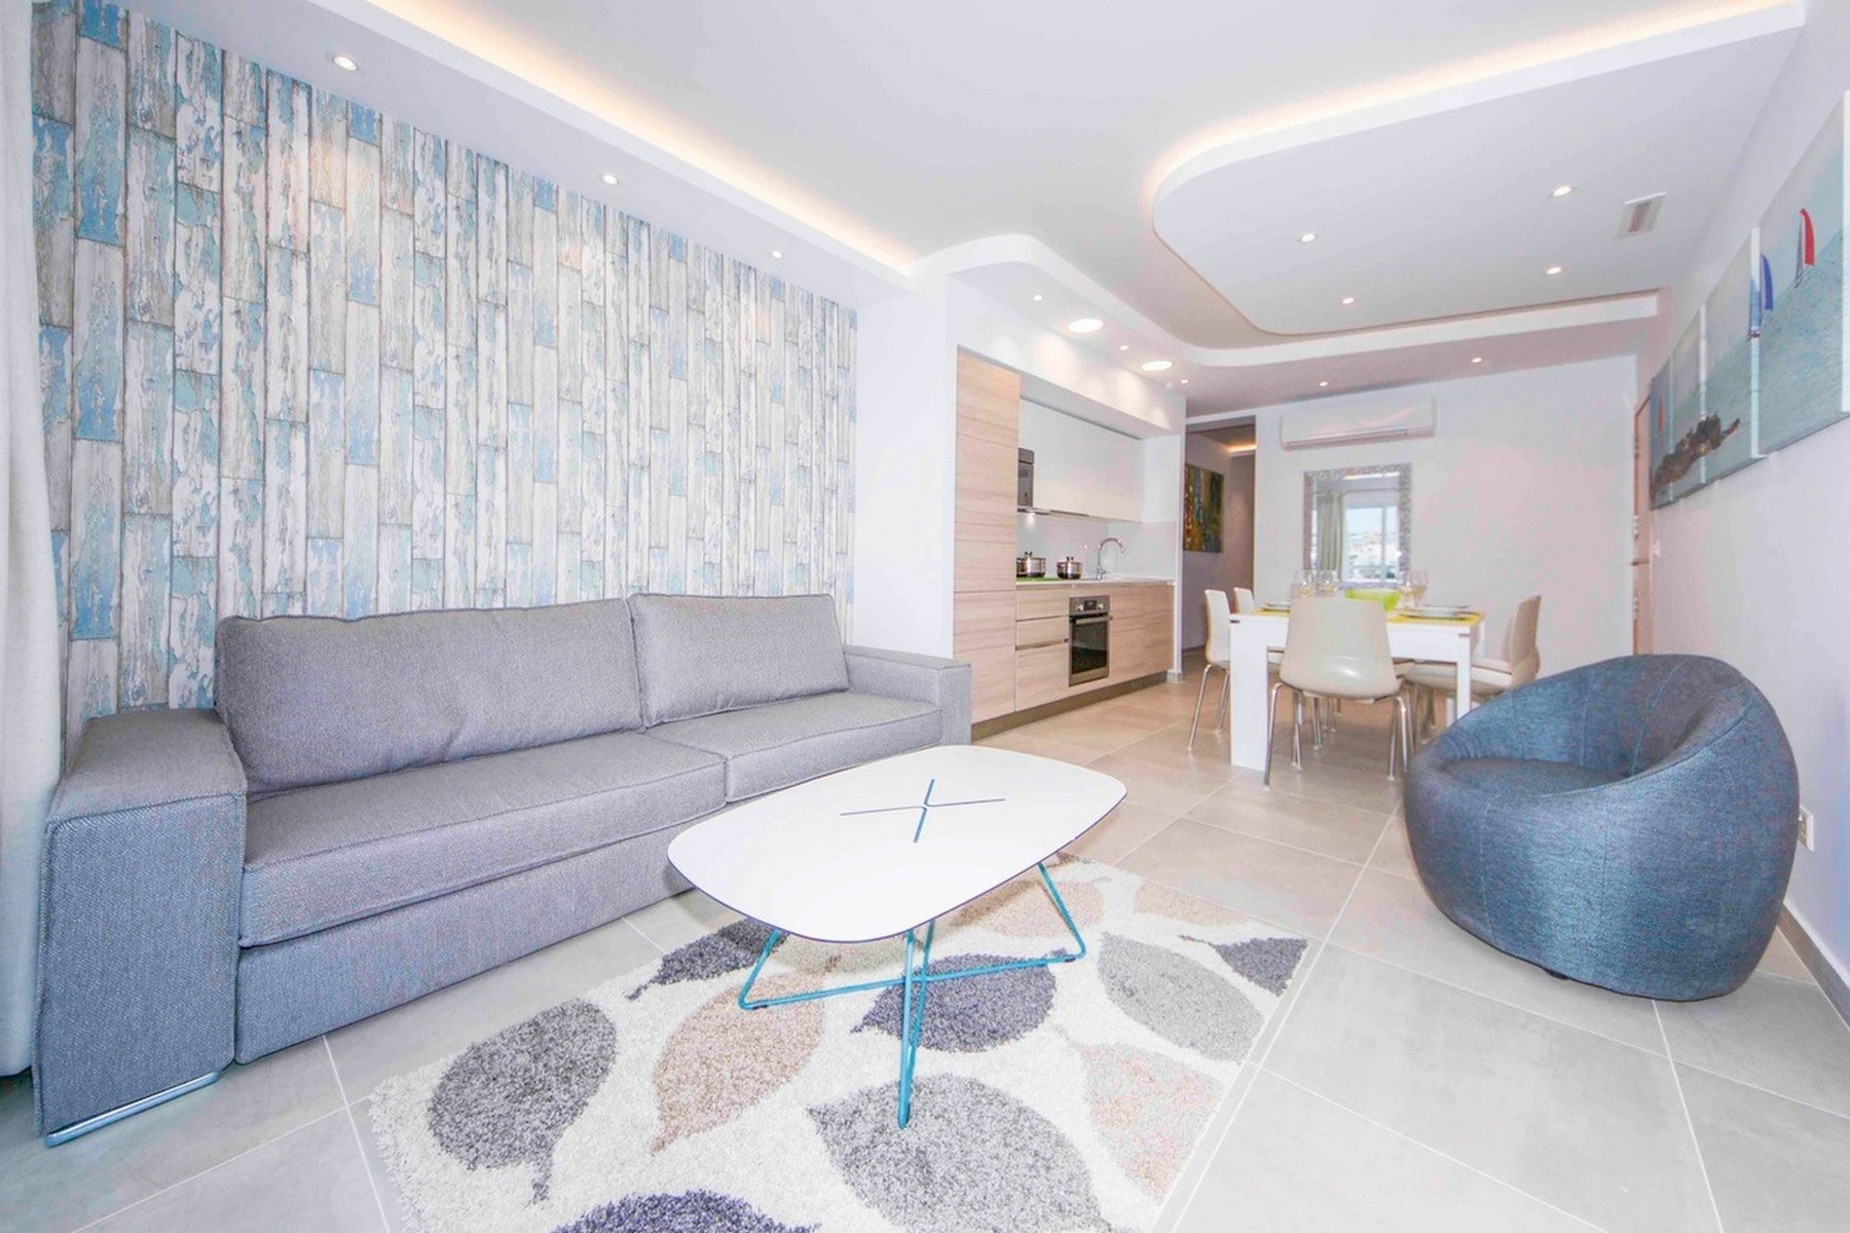 2 bed Apartment For Rent in Qawra, Qawra - thumb 5